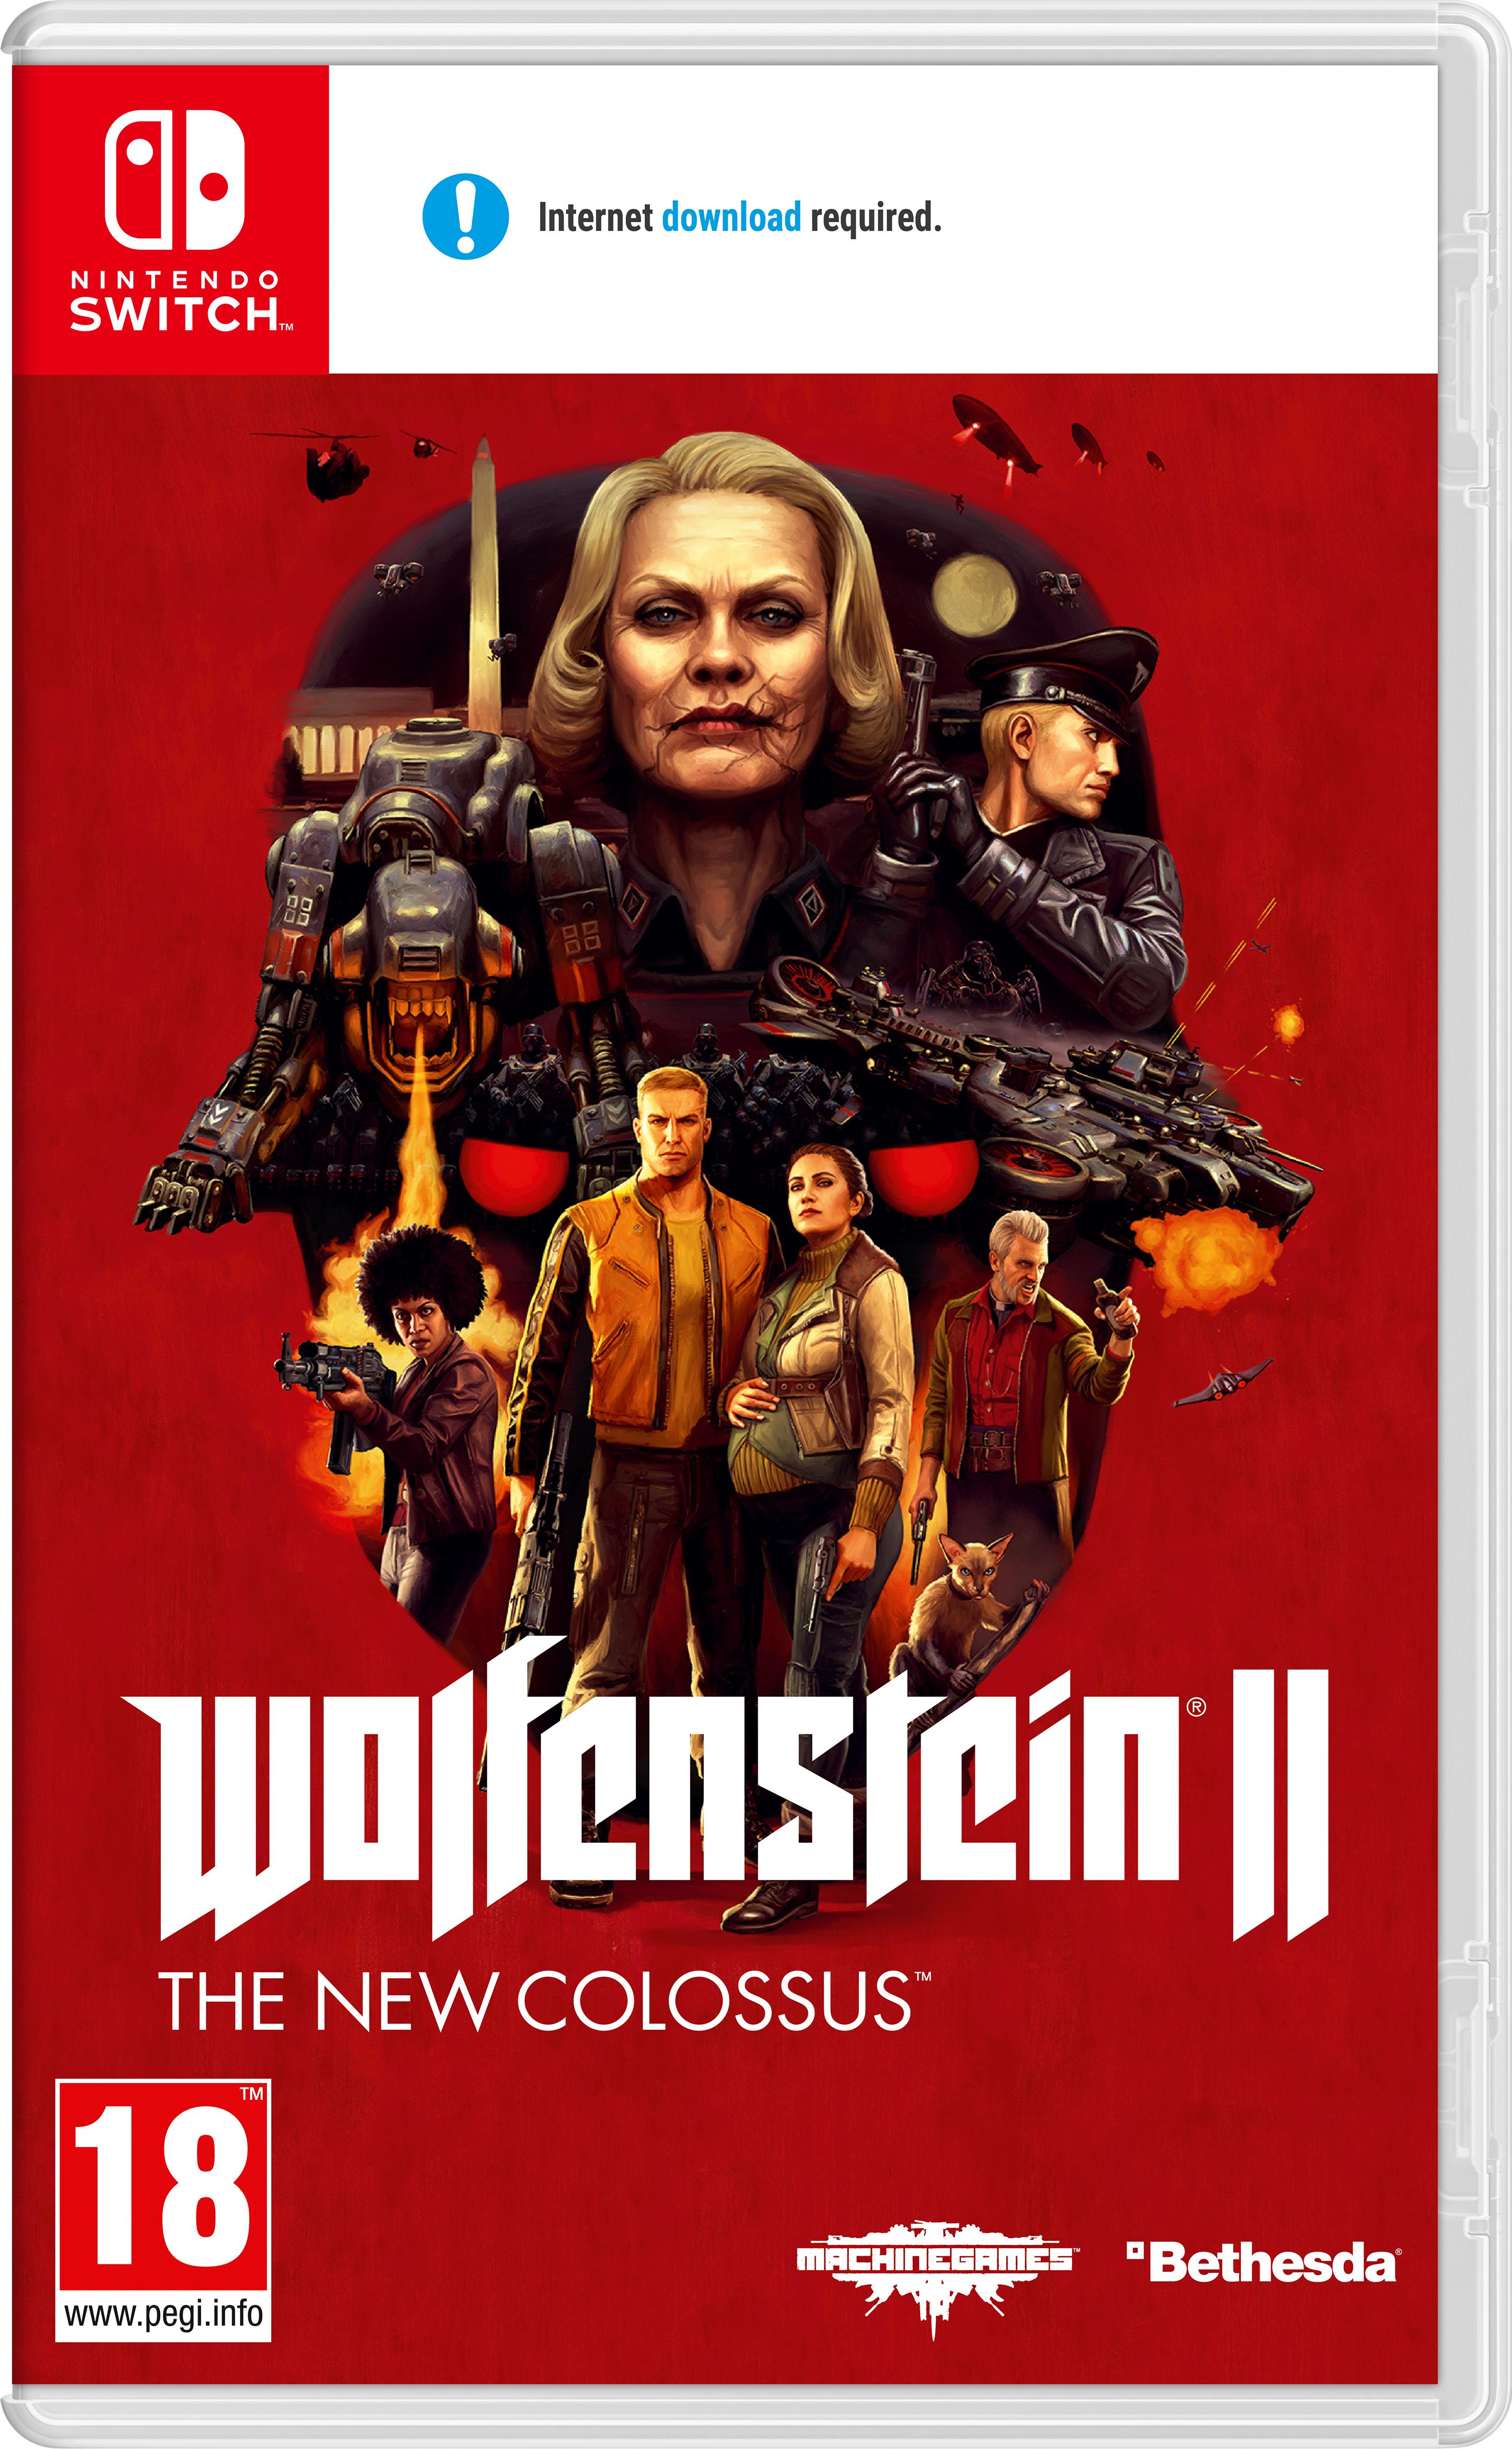 Nintendo Wolfenstein II: The New Colossus